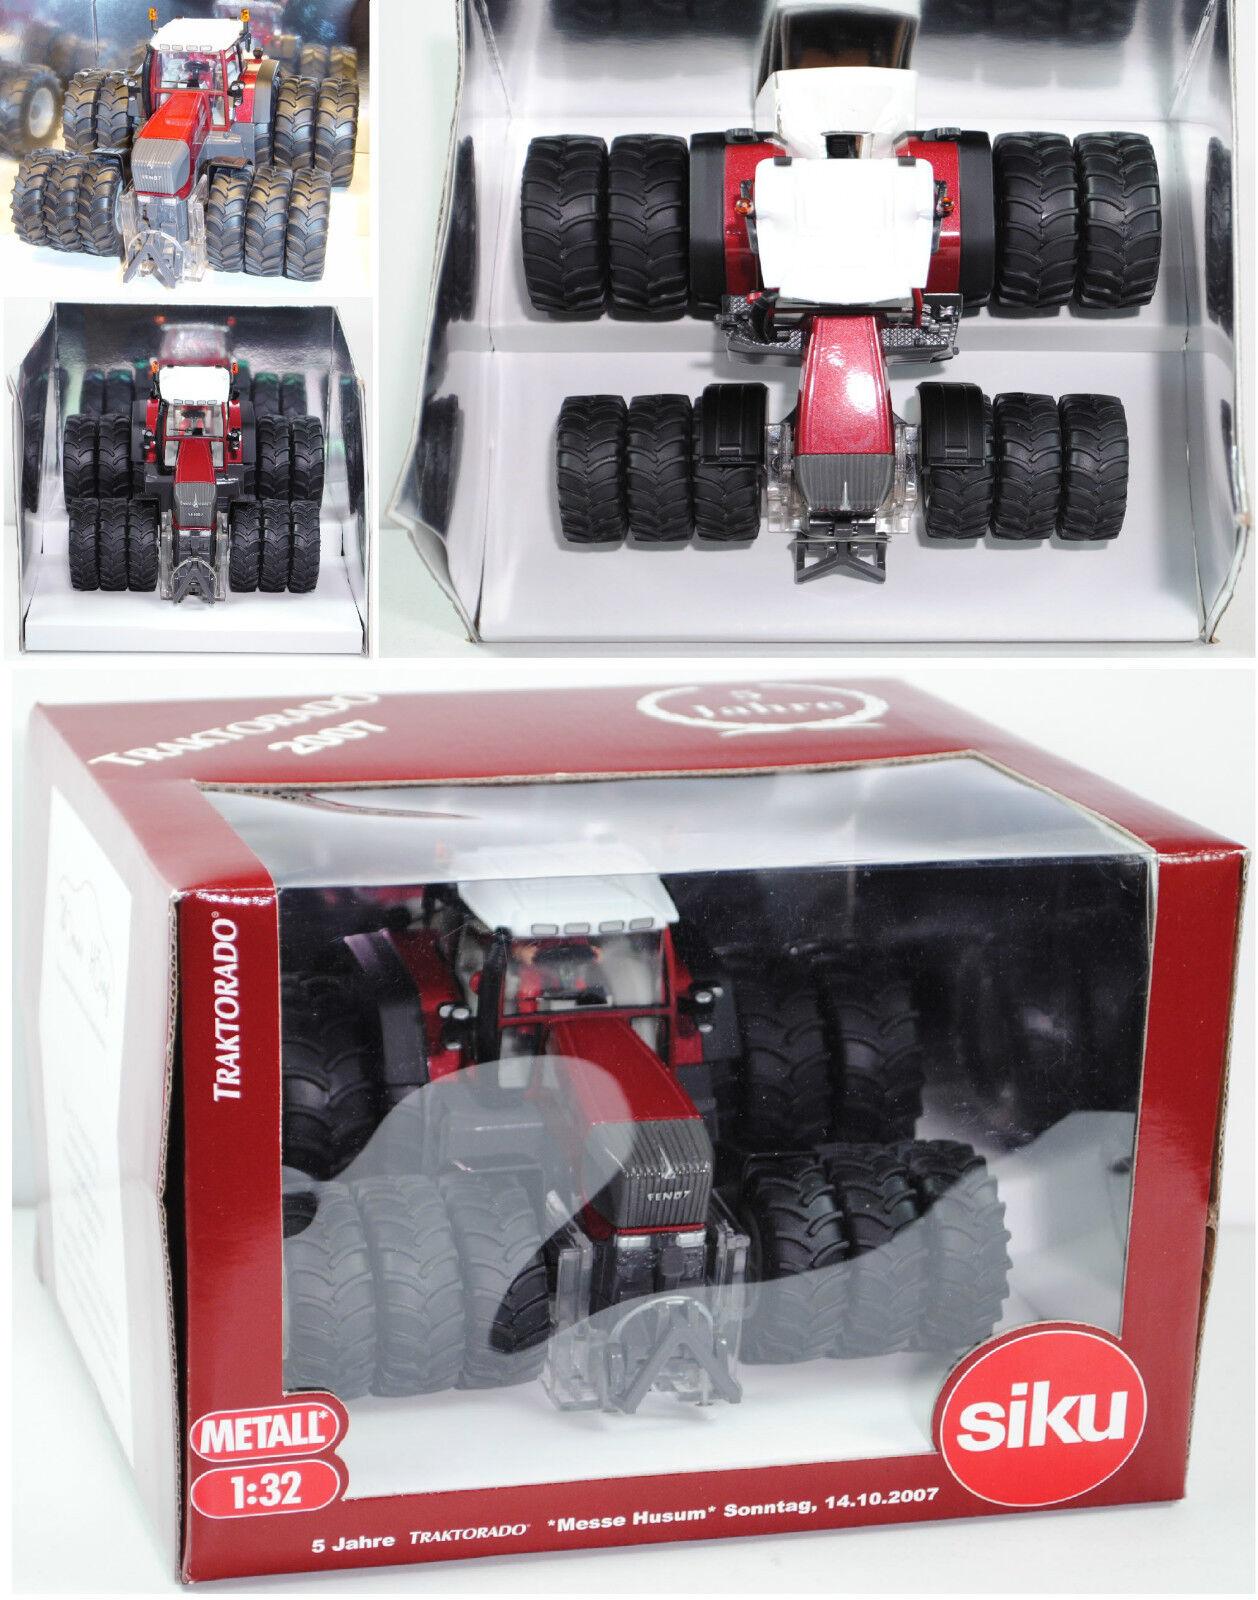 SIKU FARMER 3254 00410 FENDT 926 Drilling pneumatiques TRAKTORADO D Spécial Modèle